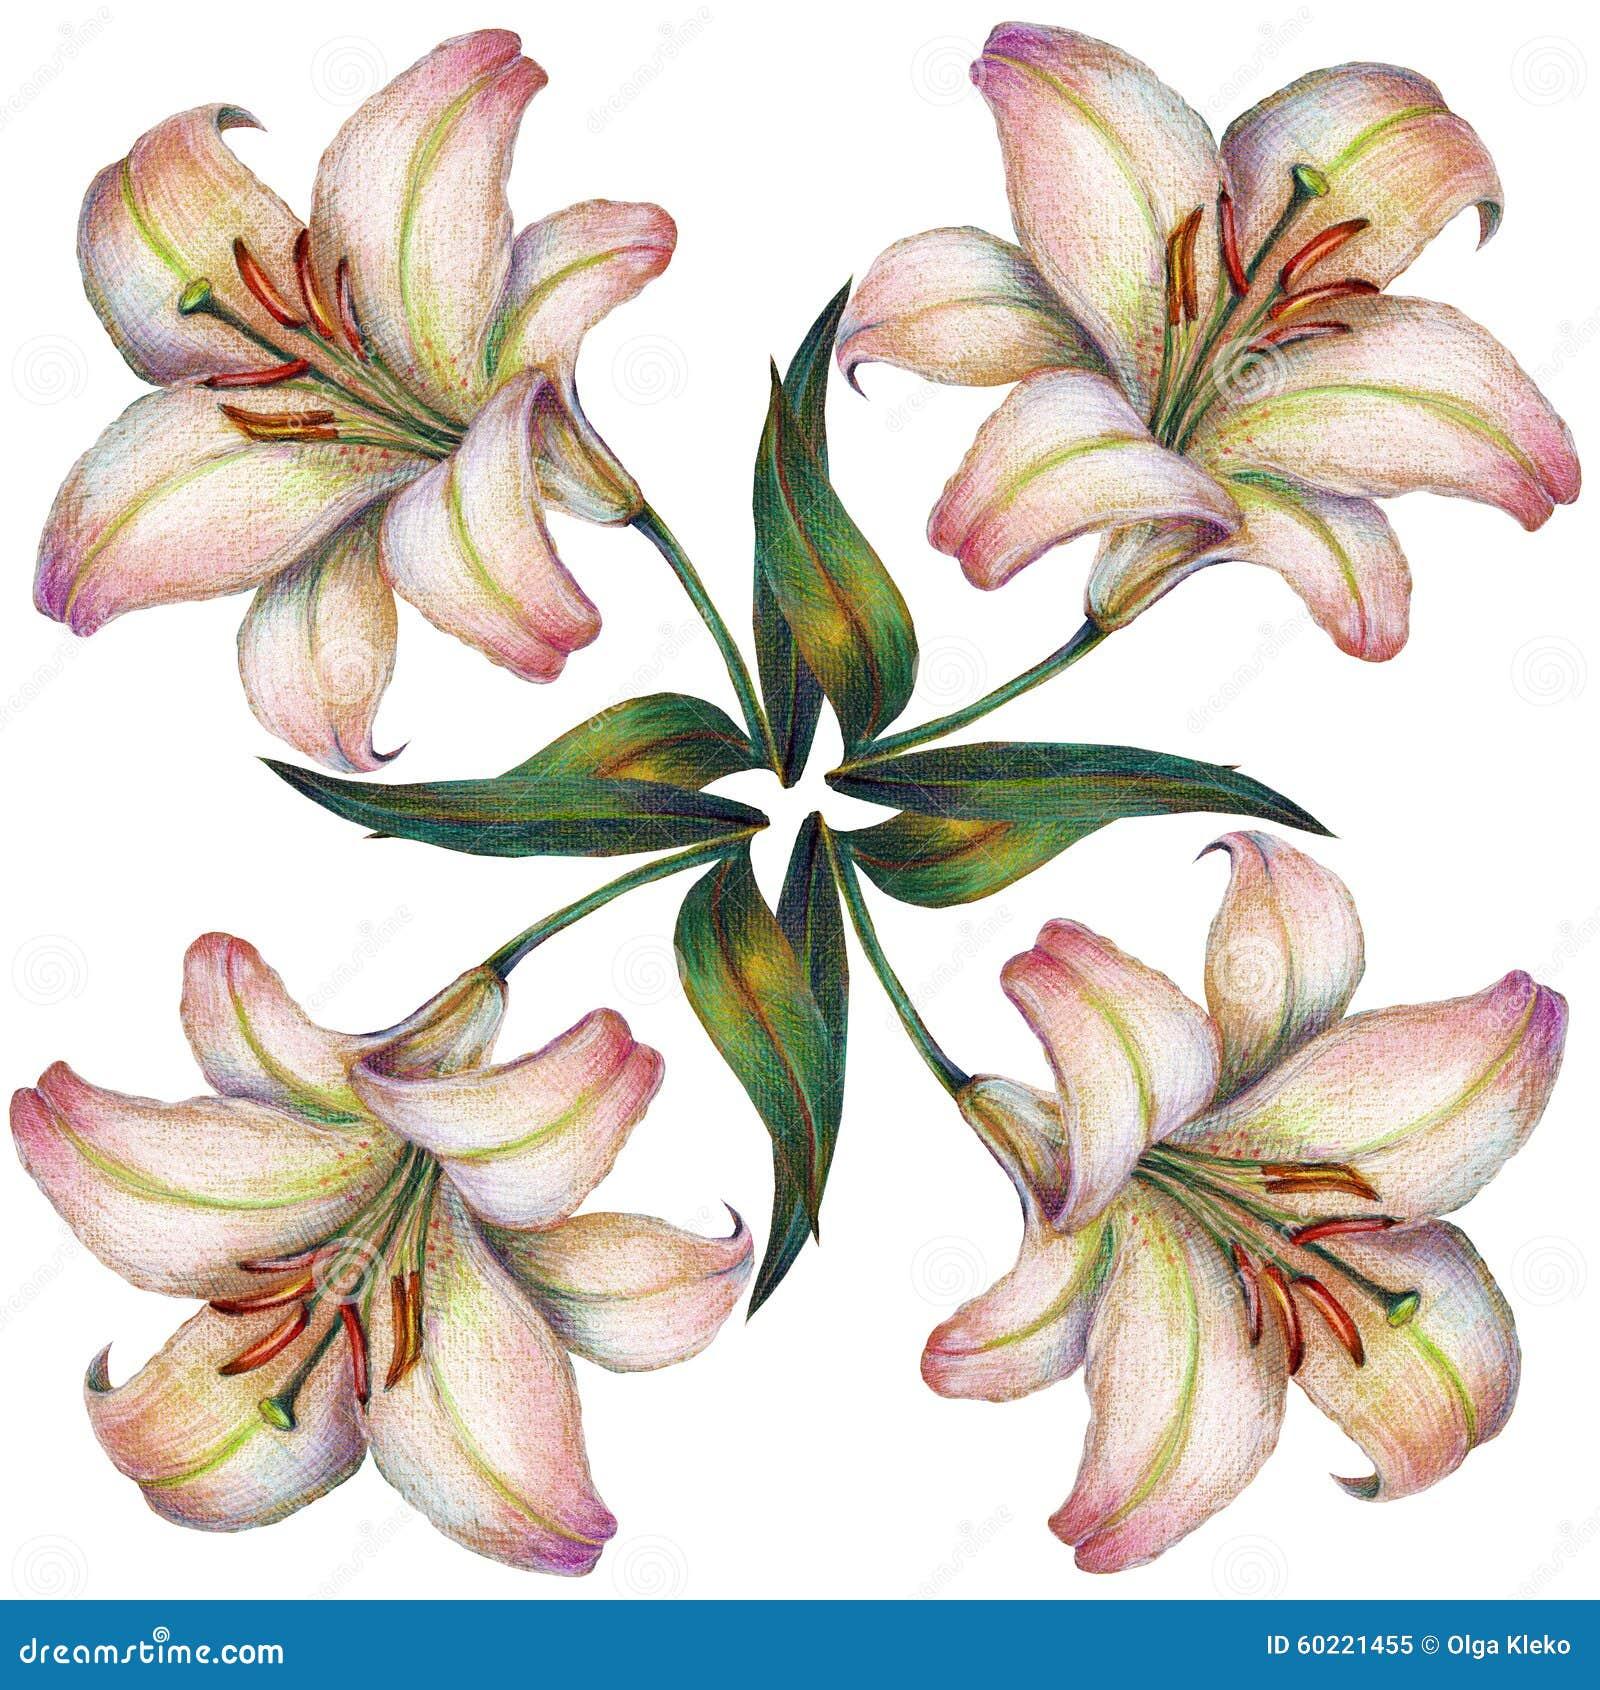 White Lily Flower Color Pencil Illustration Stock Illustration